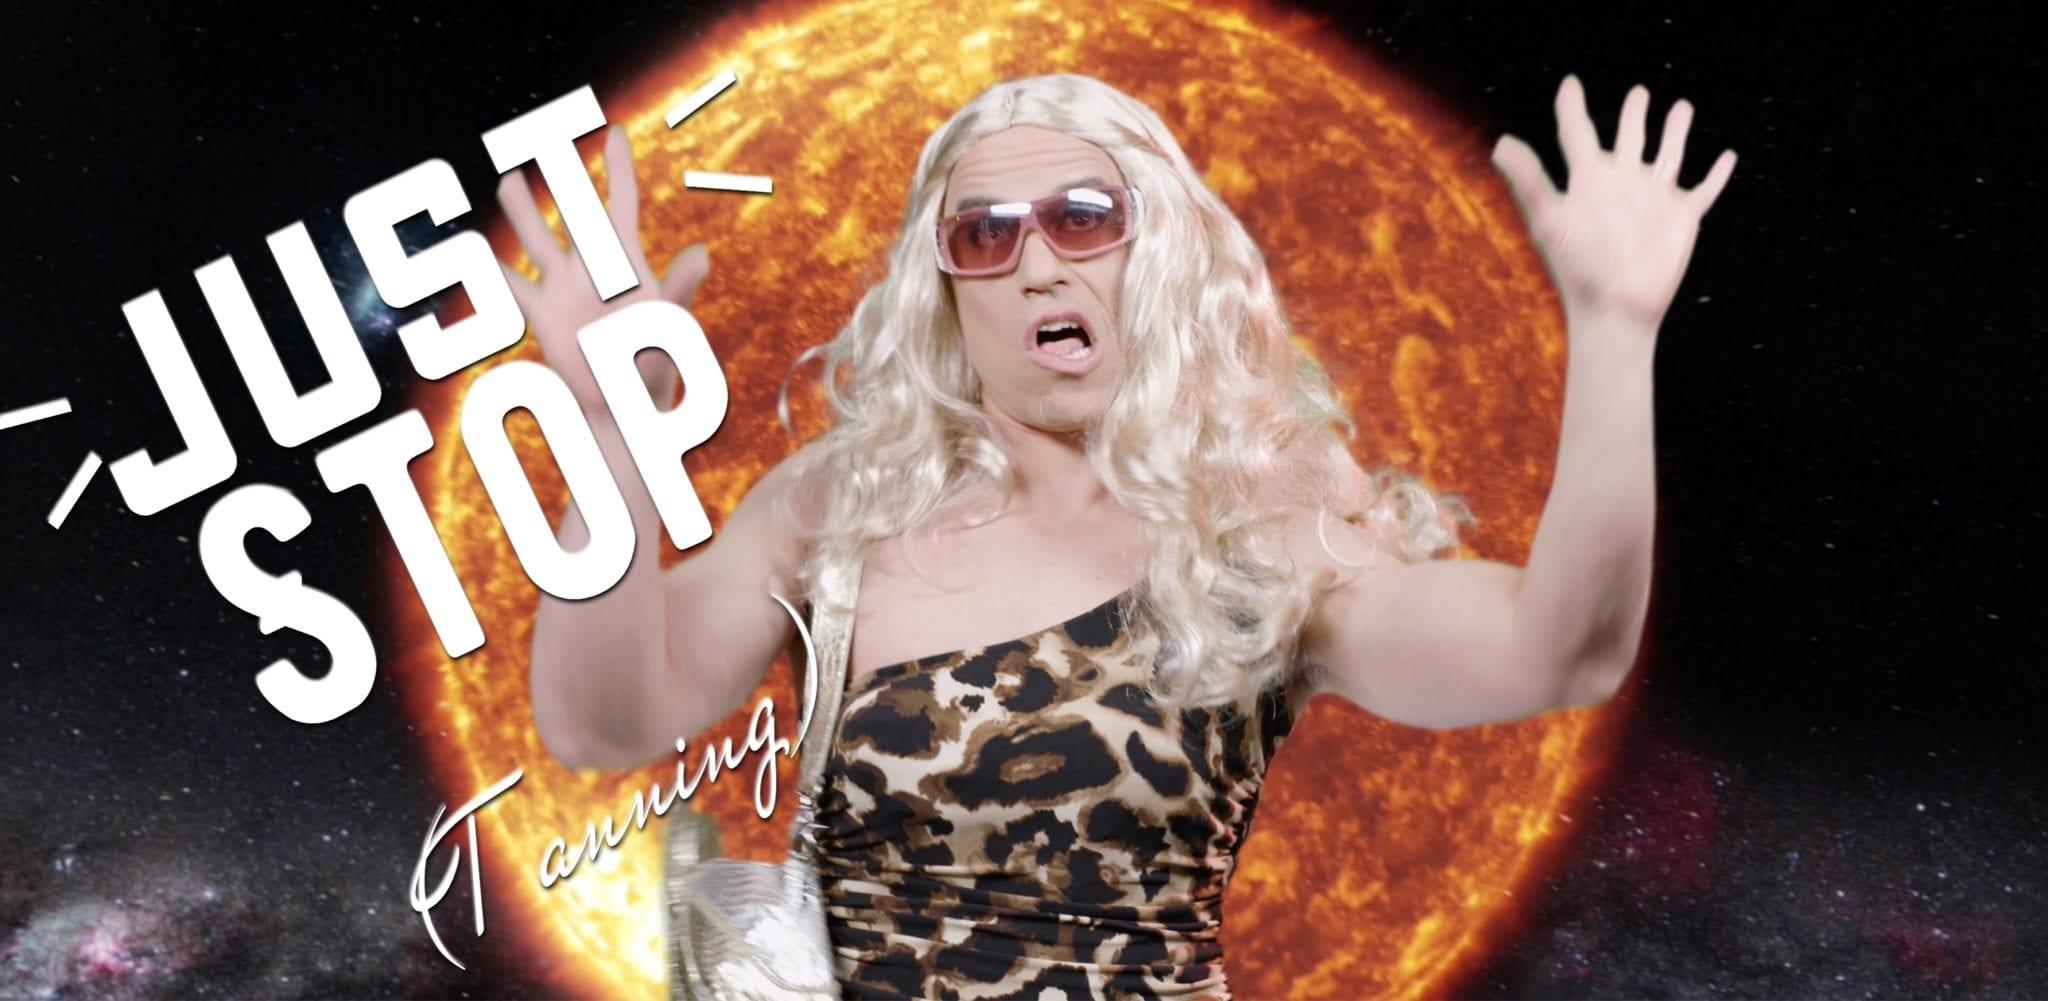 stop kesha tanning salon parody dontgetburned